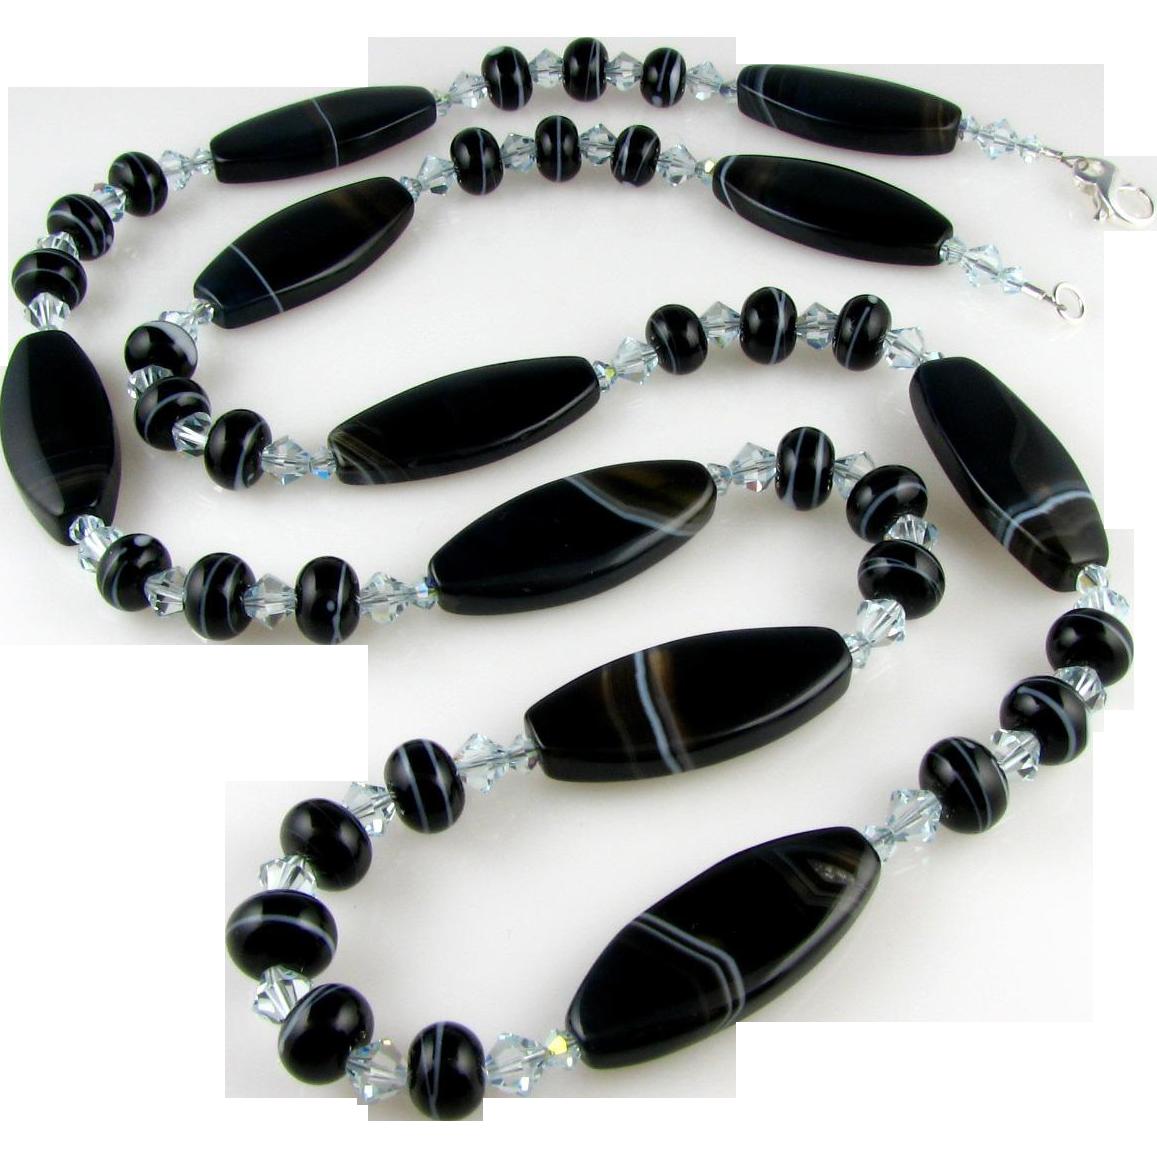 Multi Versatile - Banded Black, Italian Moretti Glass Lampwork, Gemstone Agate, 32 Inch Wearable Art Necklace